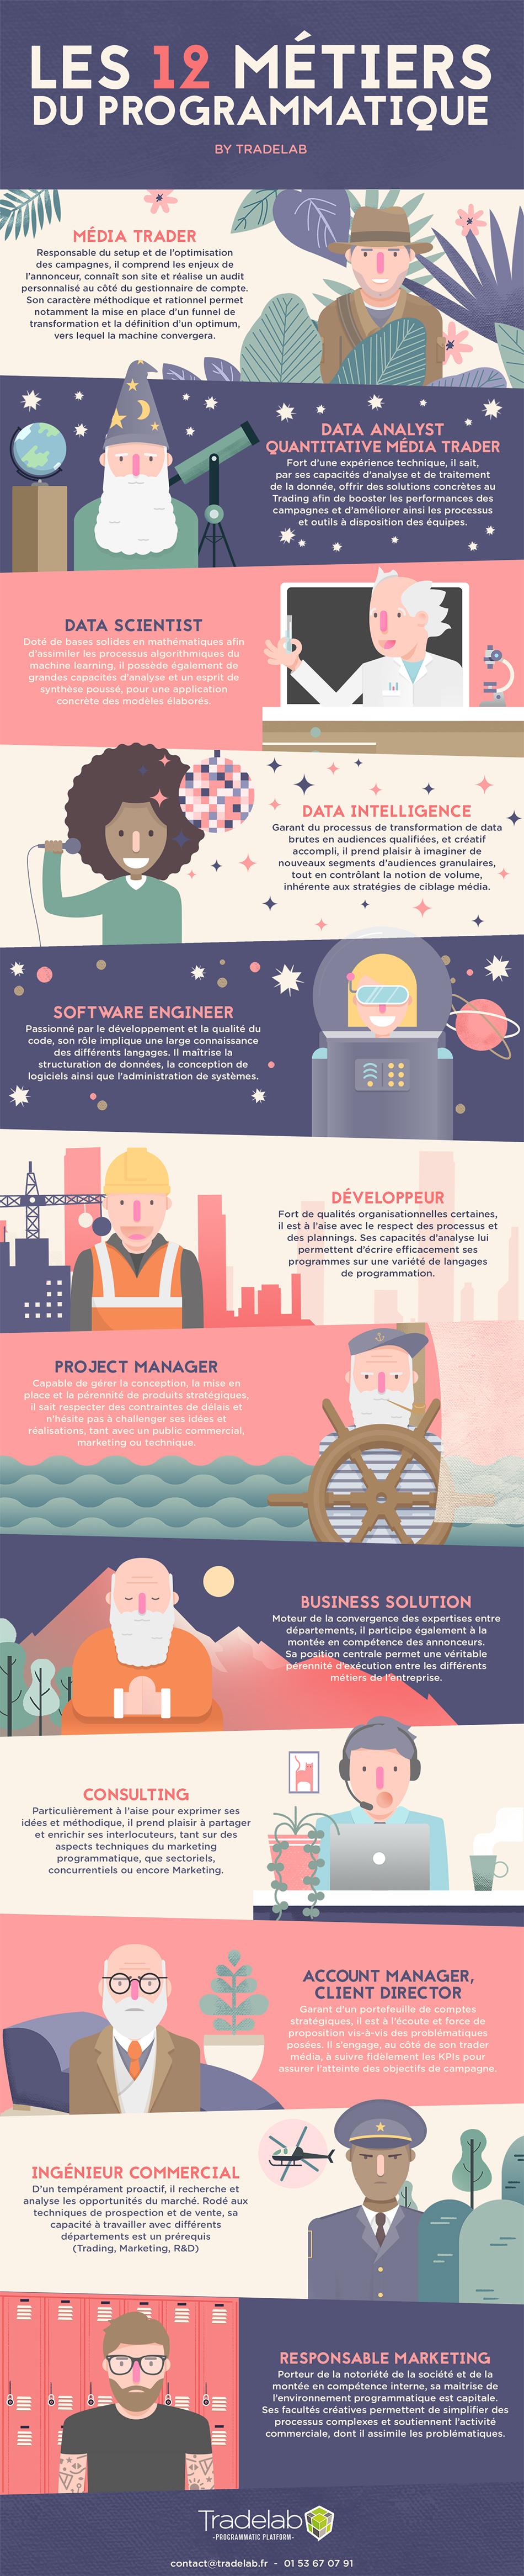 Infographie_12_metiers_du_programmatique